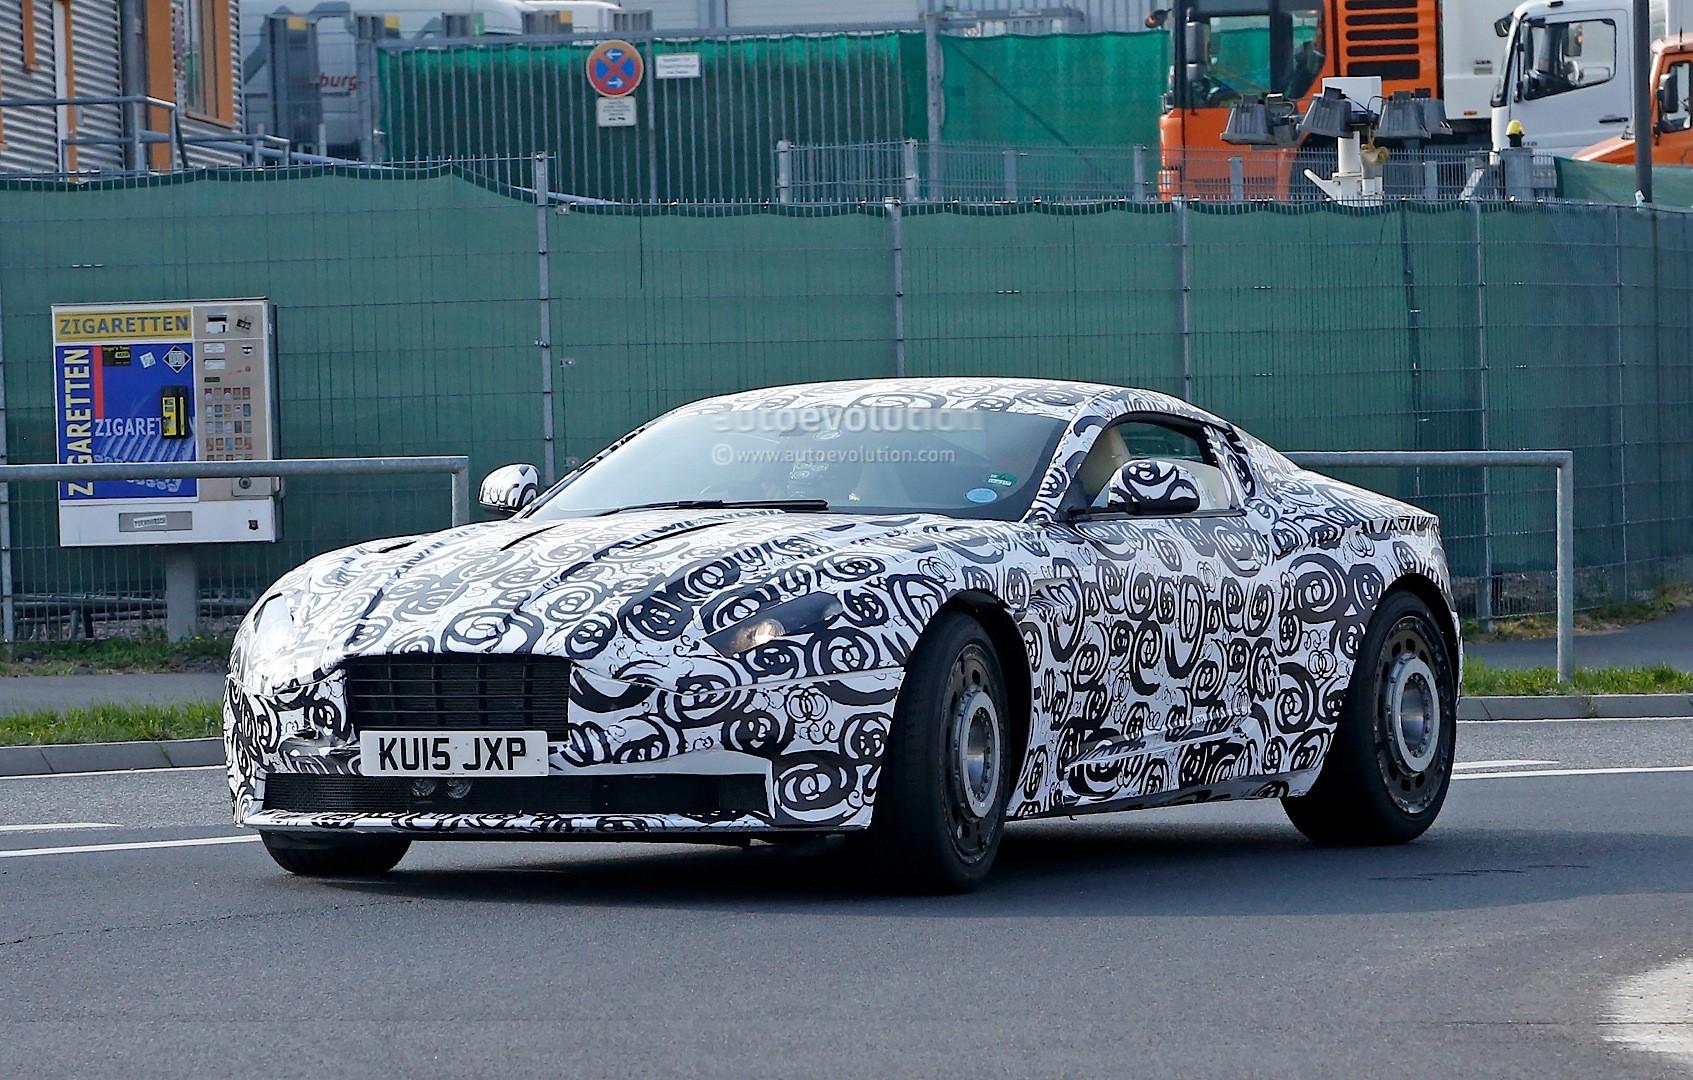 2016 - [Aston Martin] DB11 Spyshots-aston-martin-db11-prototype-seen-testing-at-the-nurburgring_9